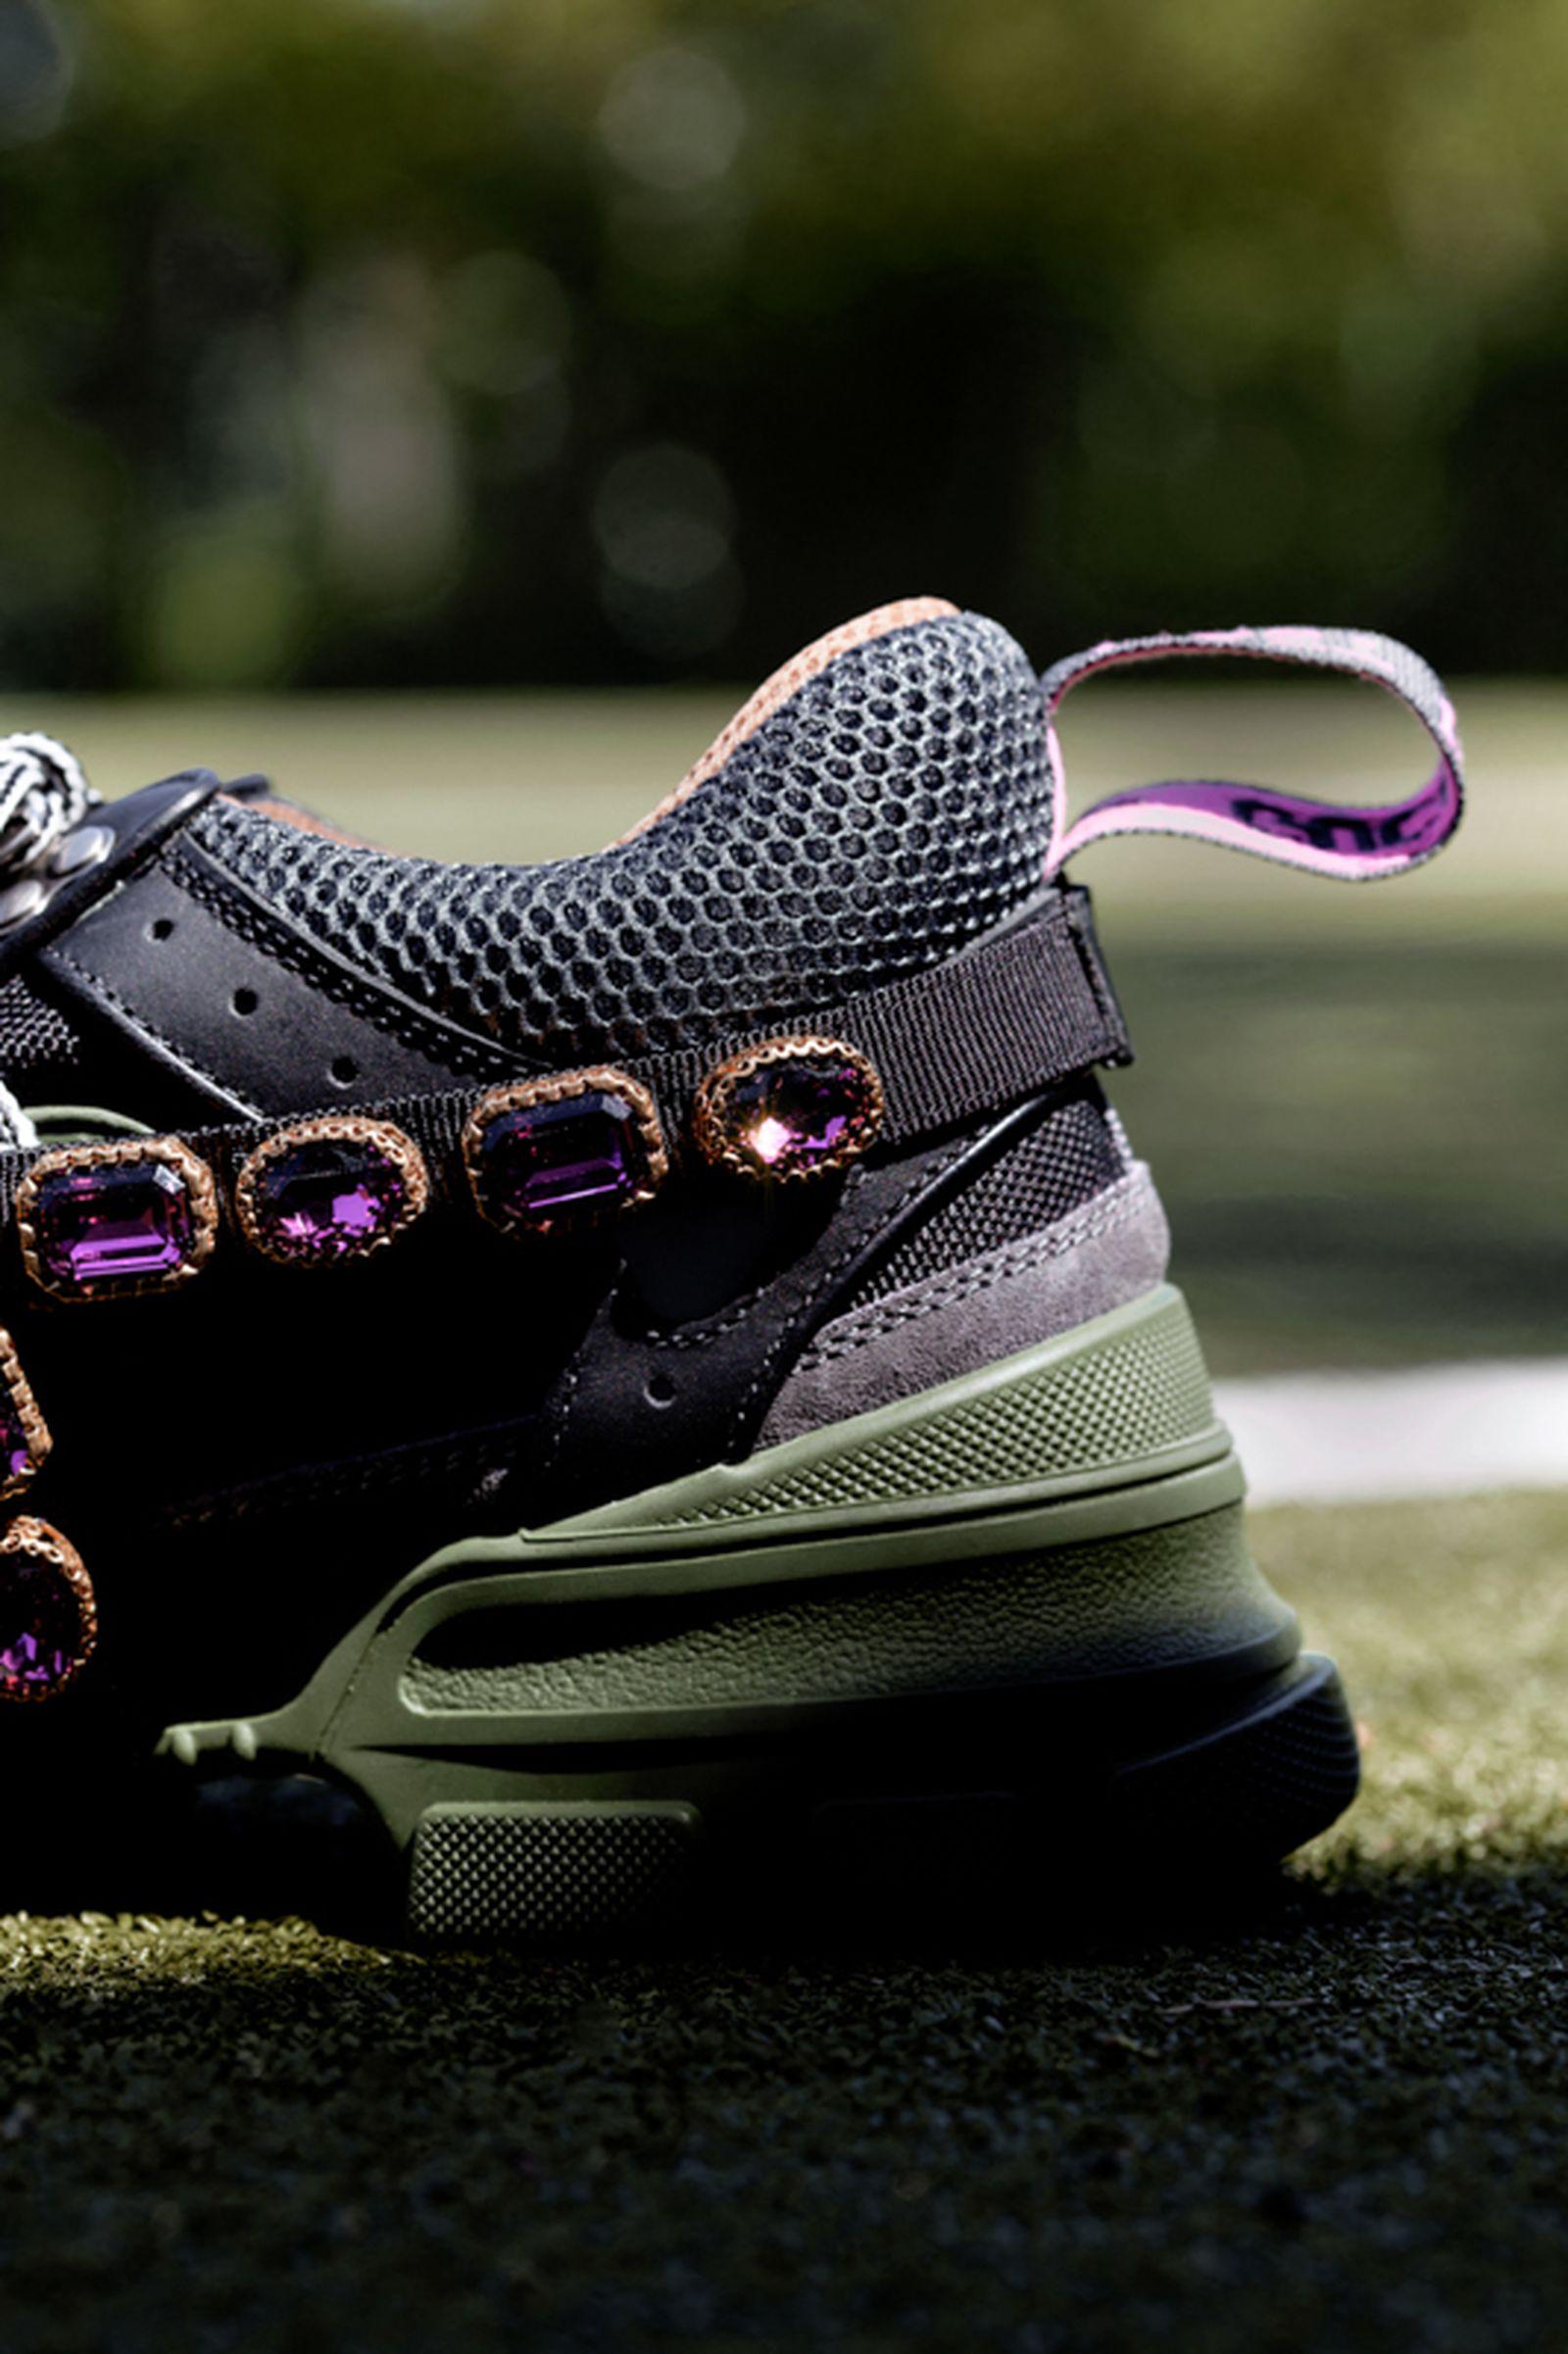 gucci-sega-crystal-sneaker-release-price-5